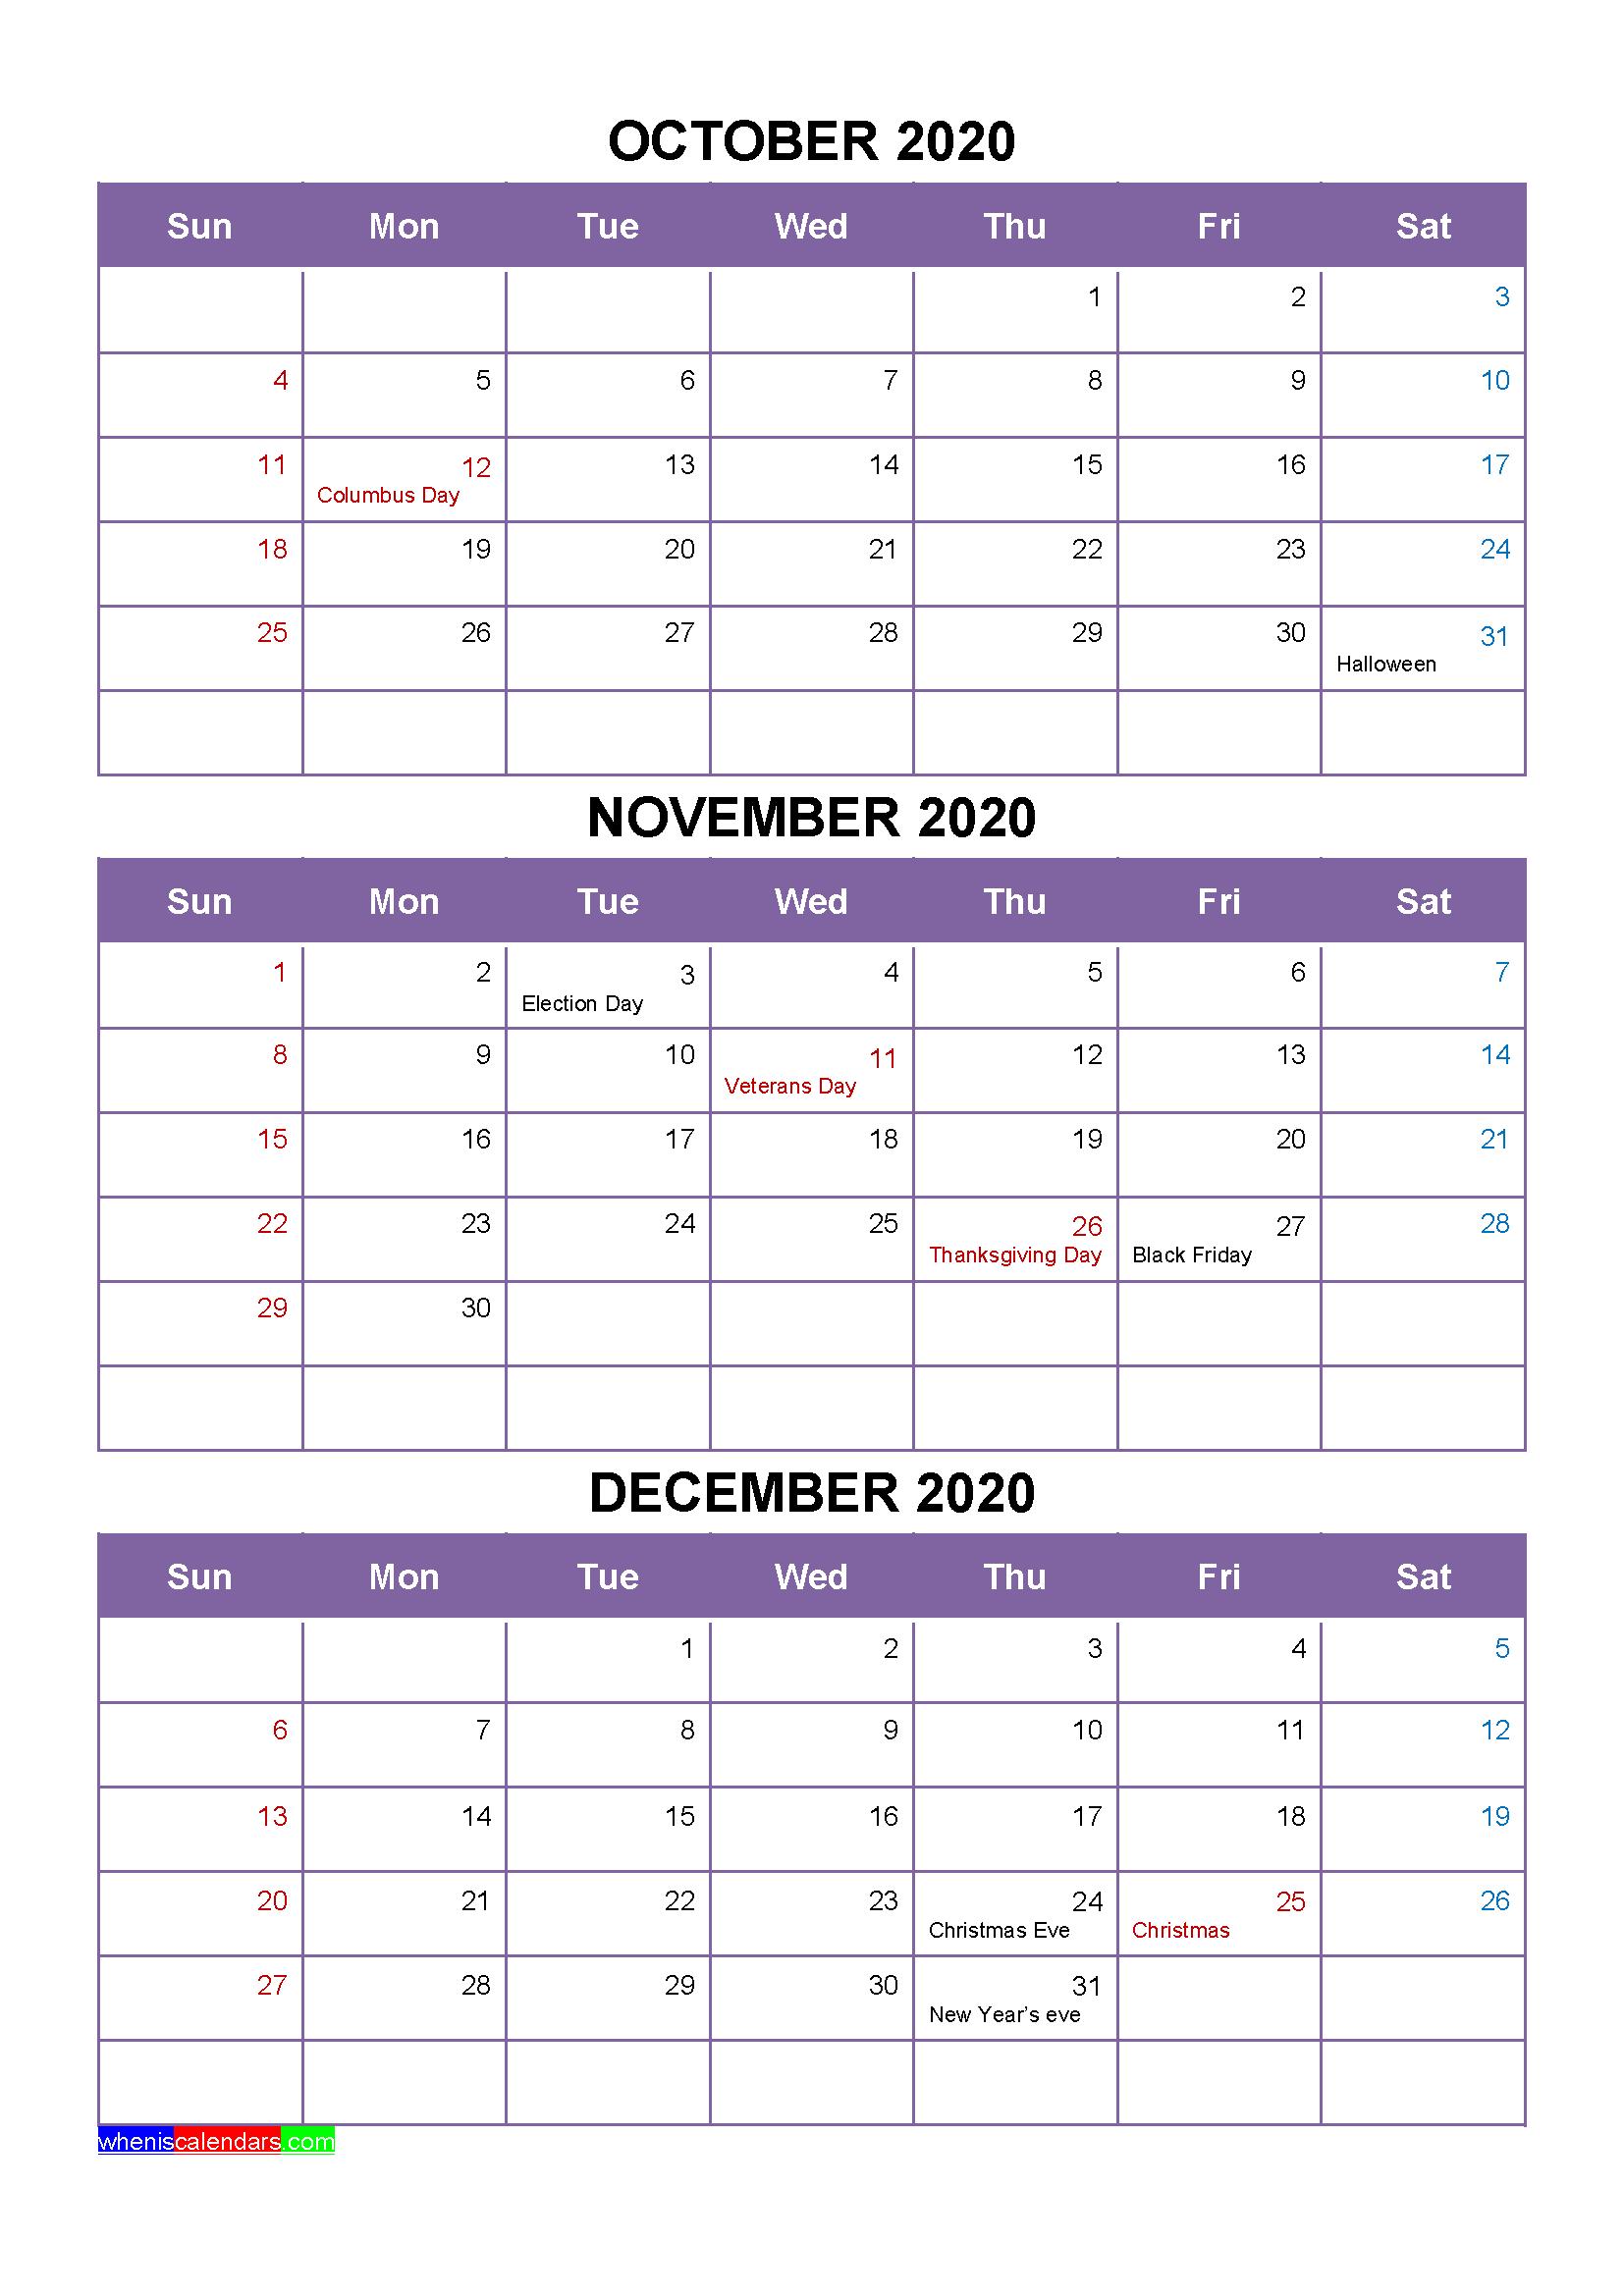 Free Calendar October November December 2020 with Holidays